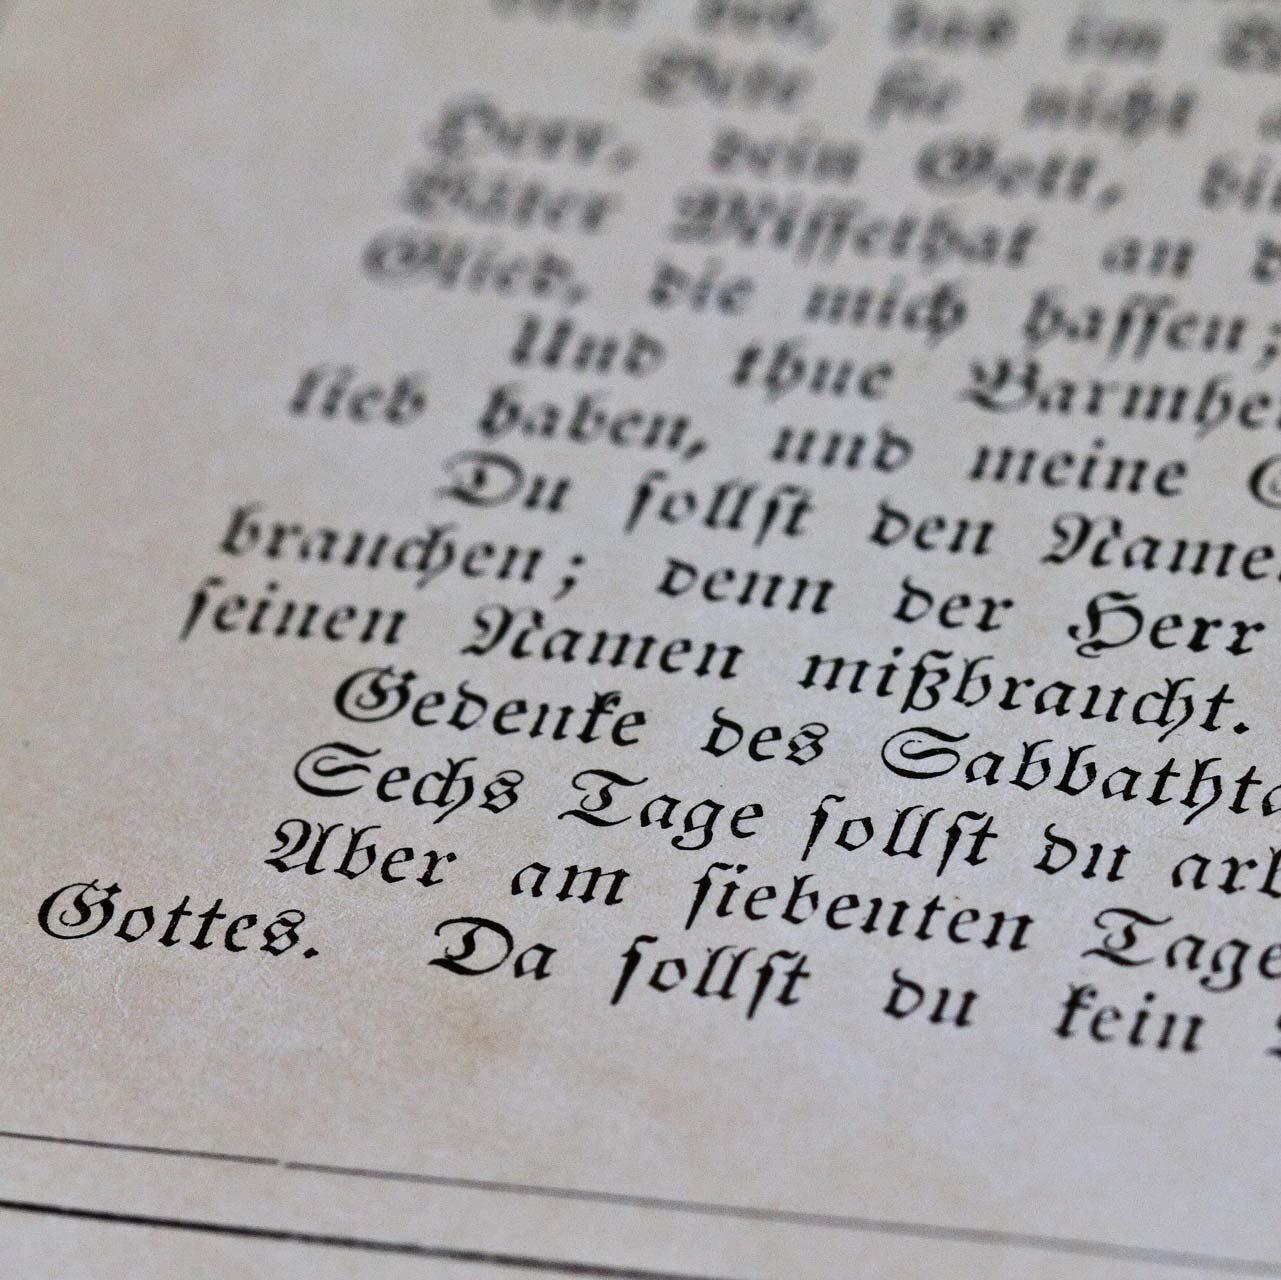 10 Commandments (© Matthias Mueller / churchphoto.de)